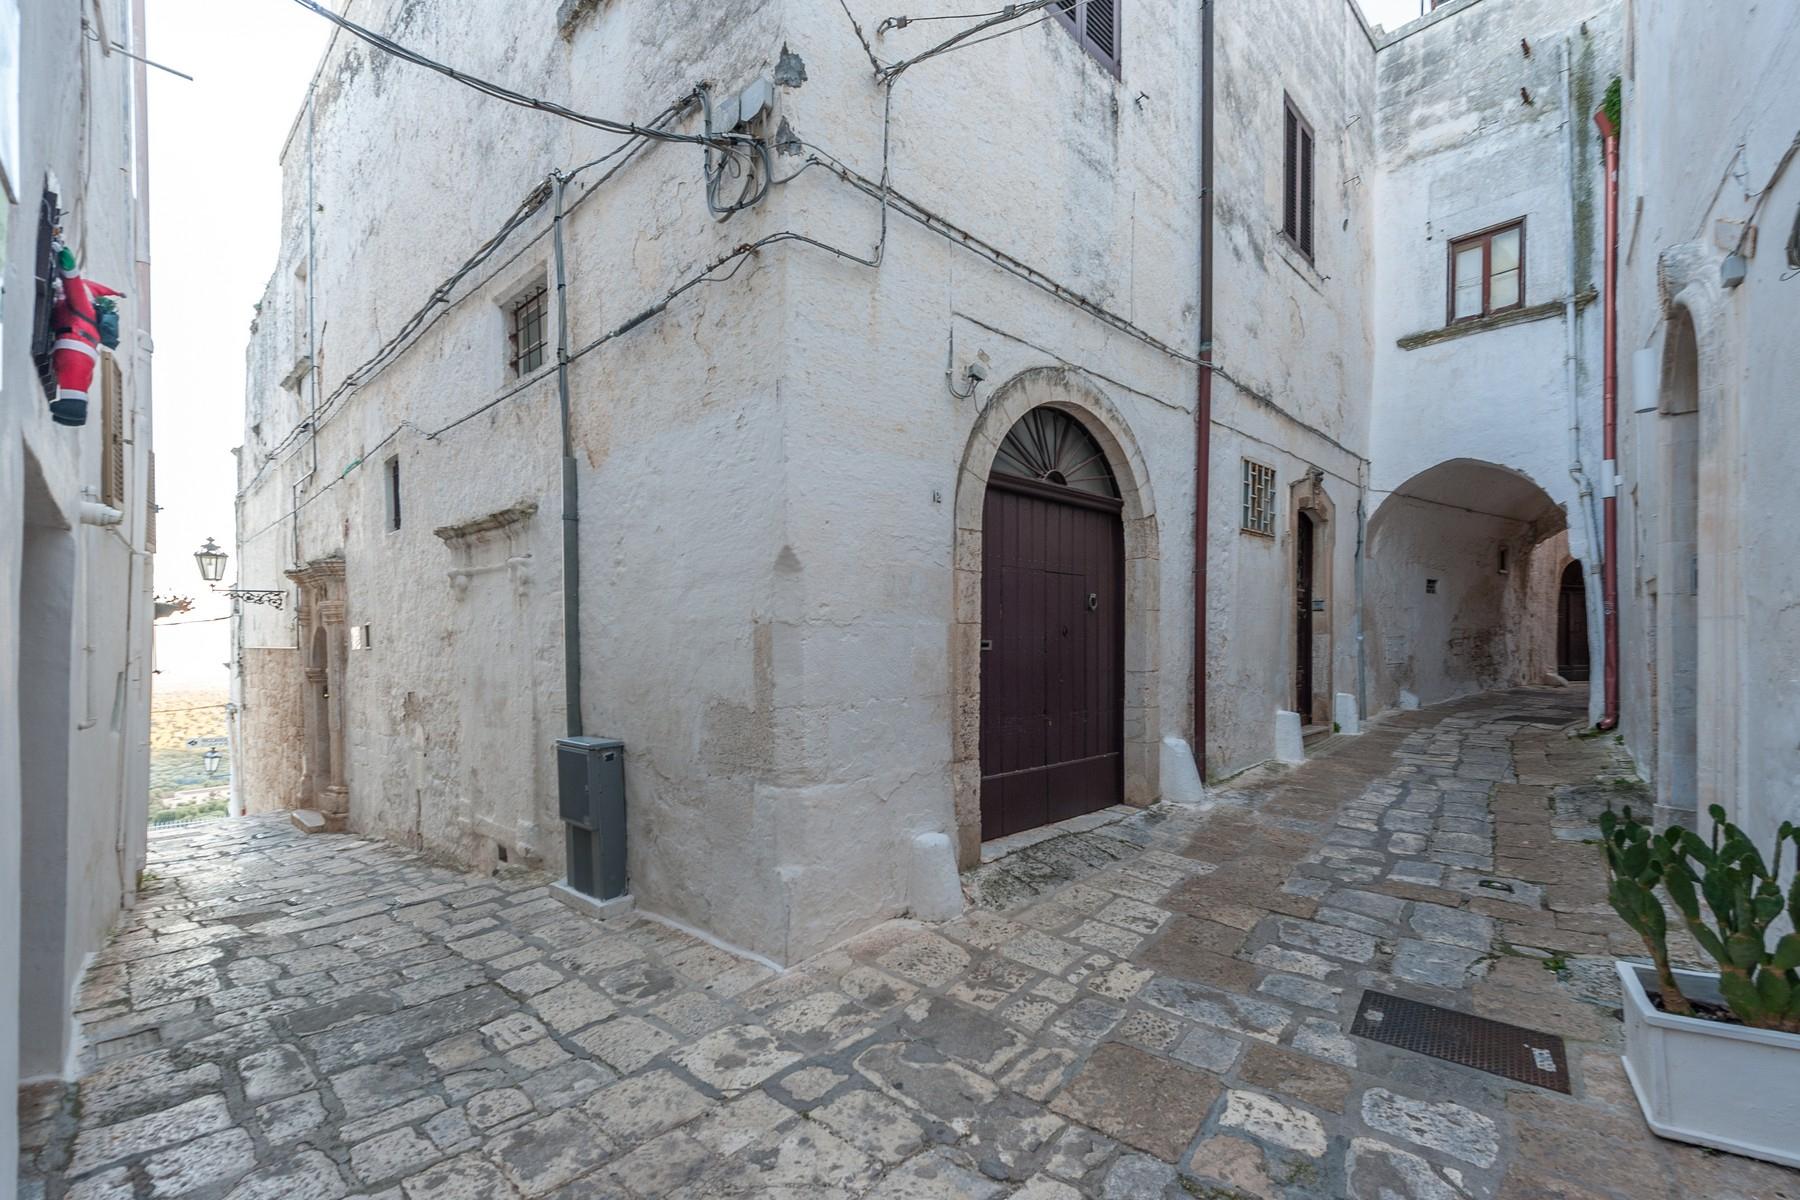 Appartamento in Vendita a Ostuni: 5 locali, 265 mq - Foto 14